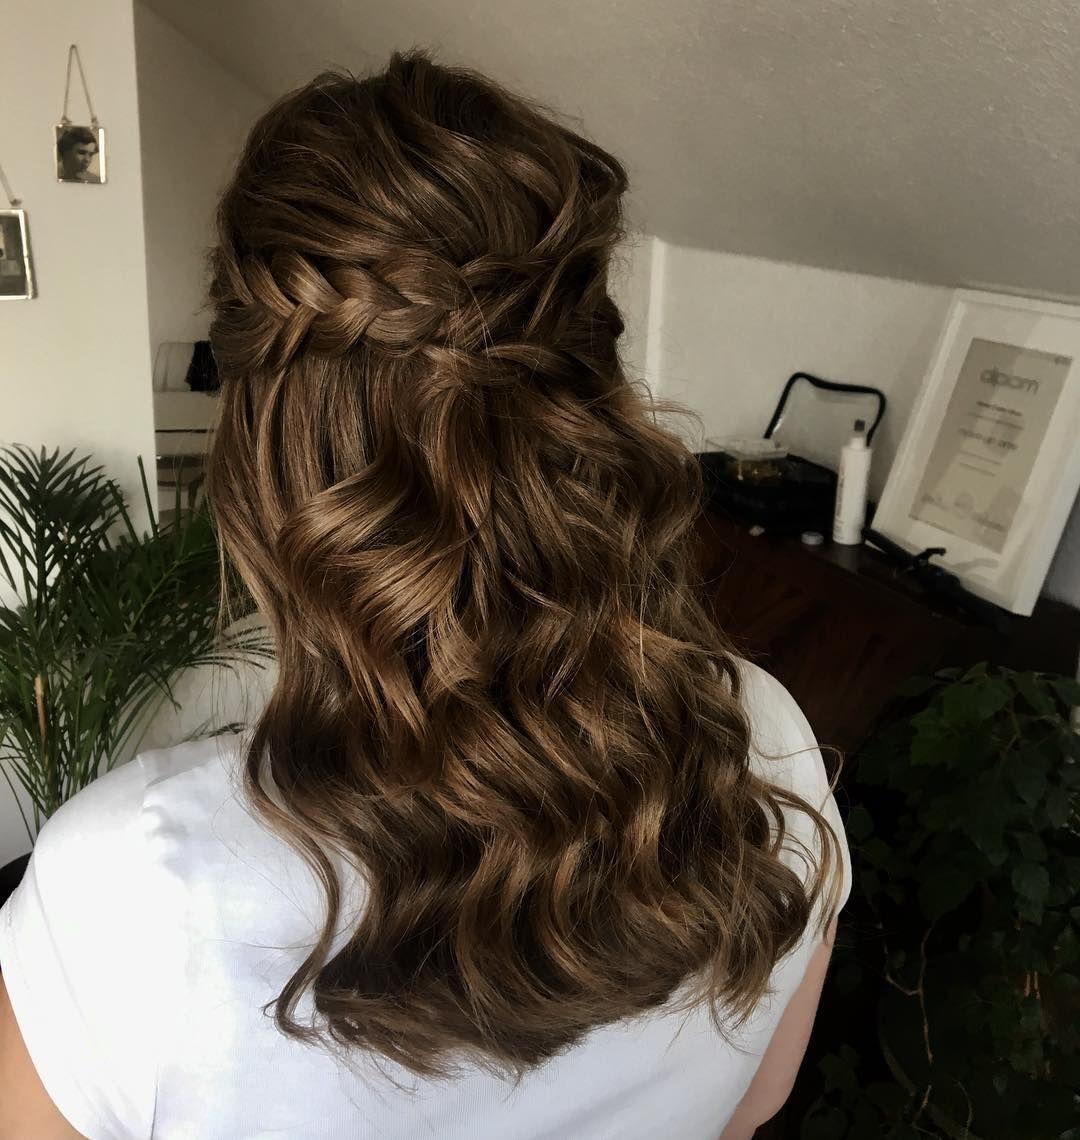 Gorgeous half up half down wedding hairstyle ideas